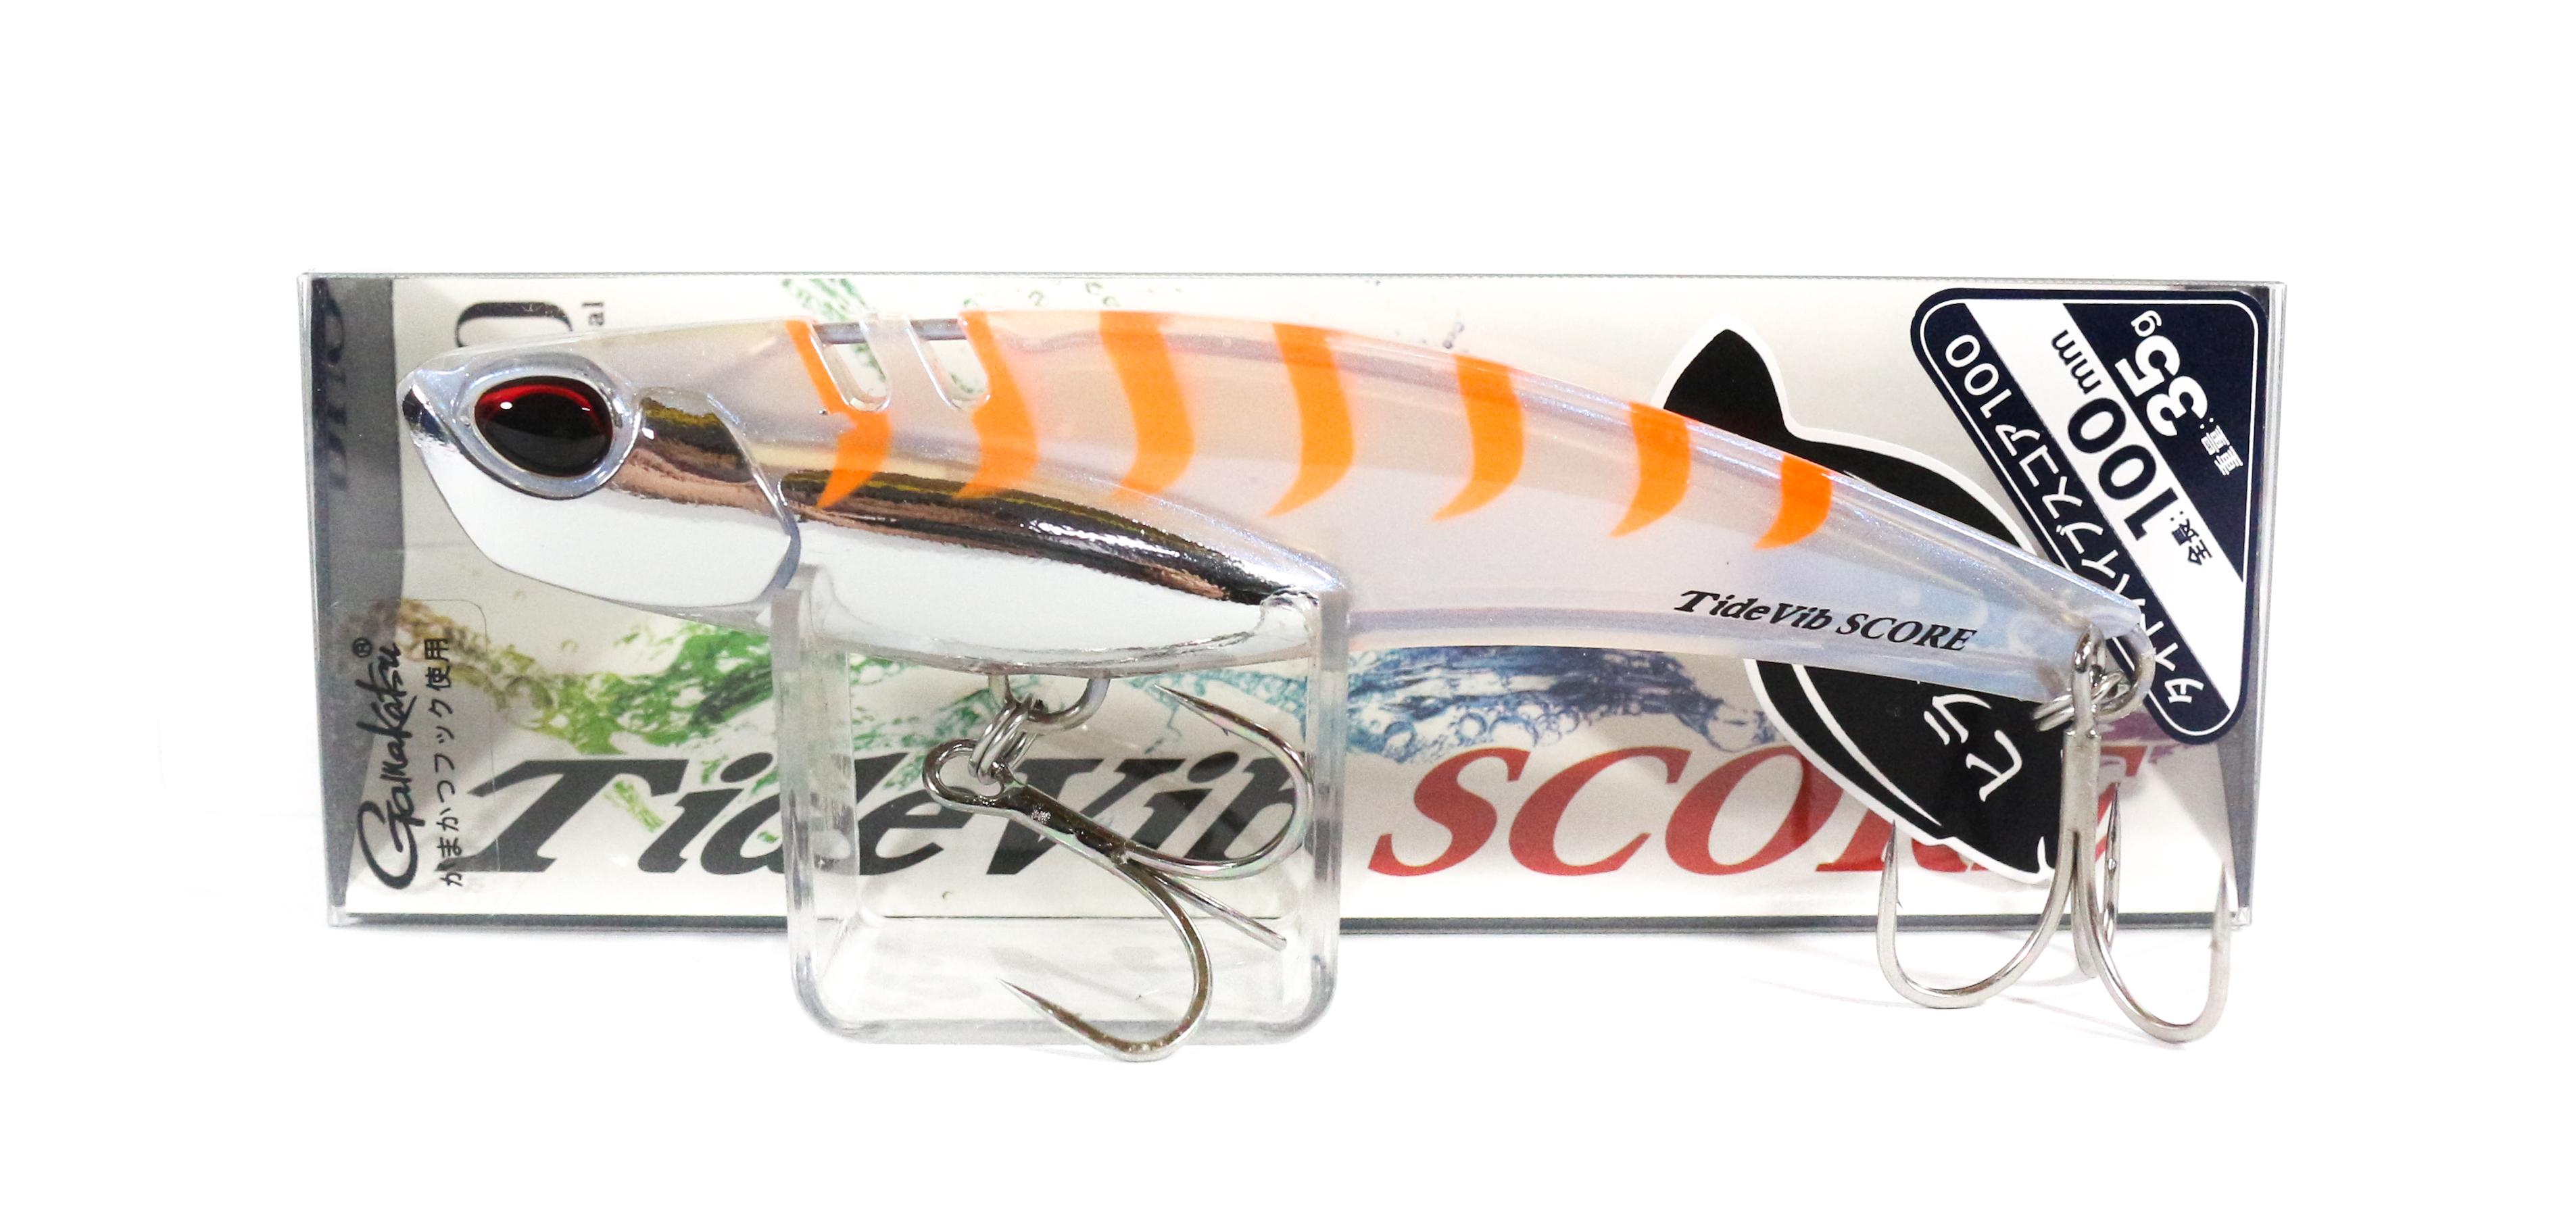 Sale Duo Tide Vib Score 100 Sinking Vibration Lure CSI0206 (0371)